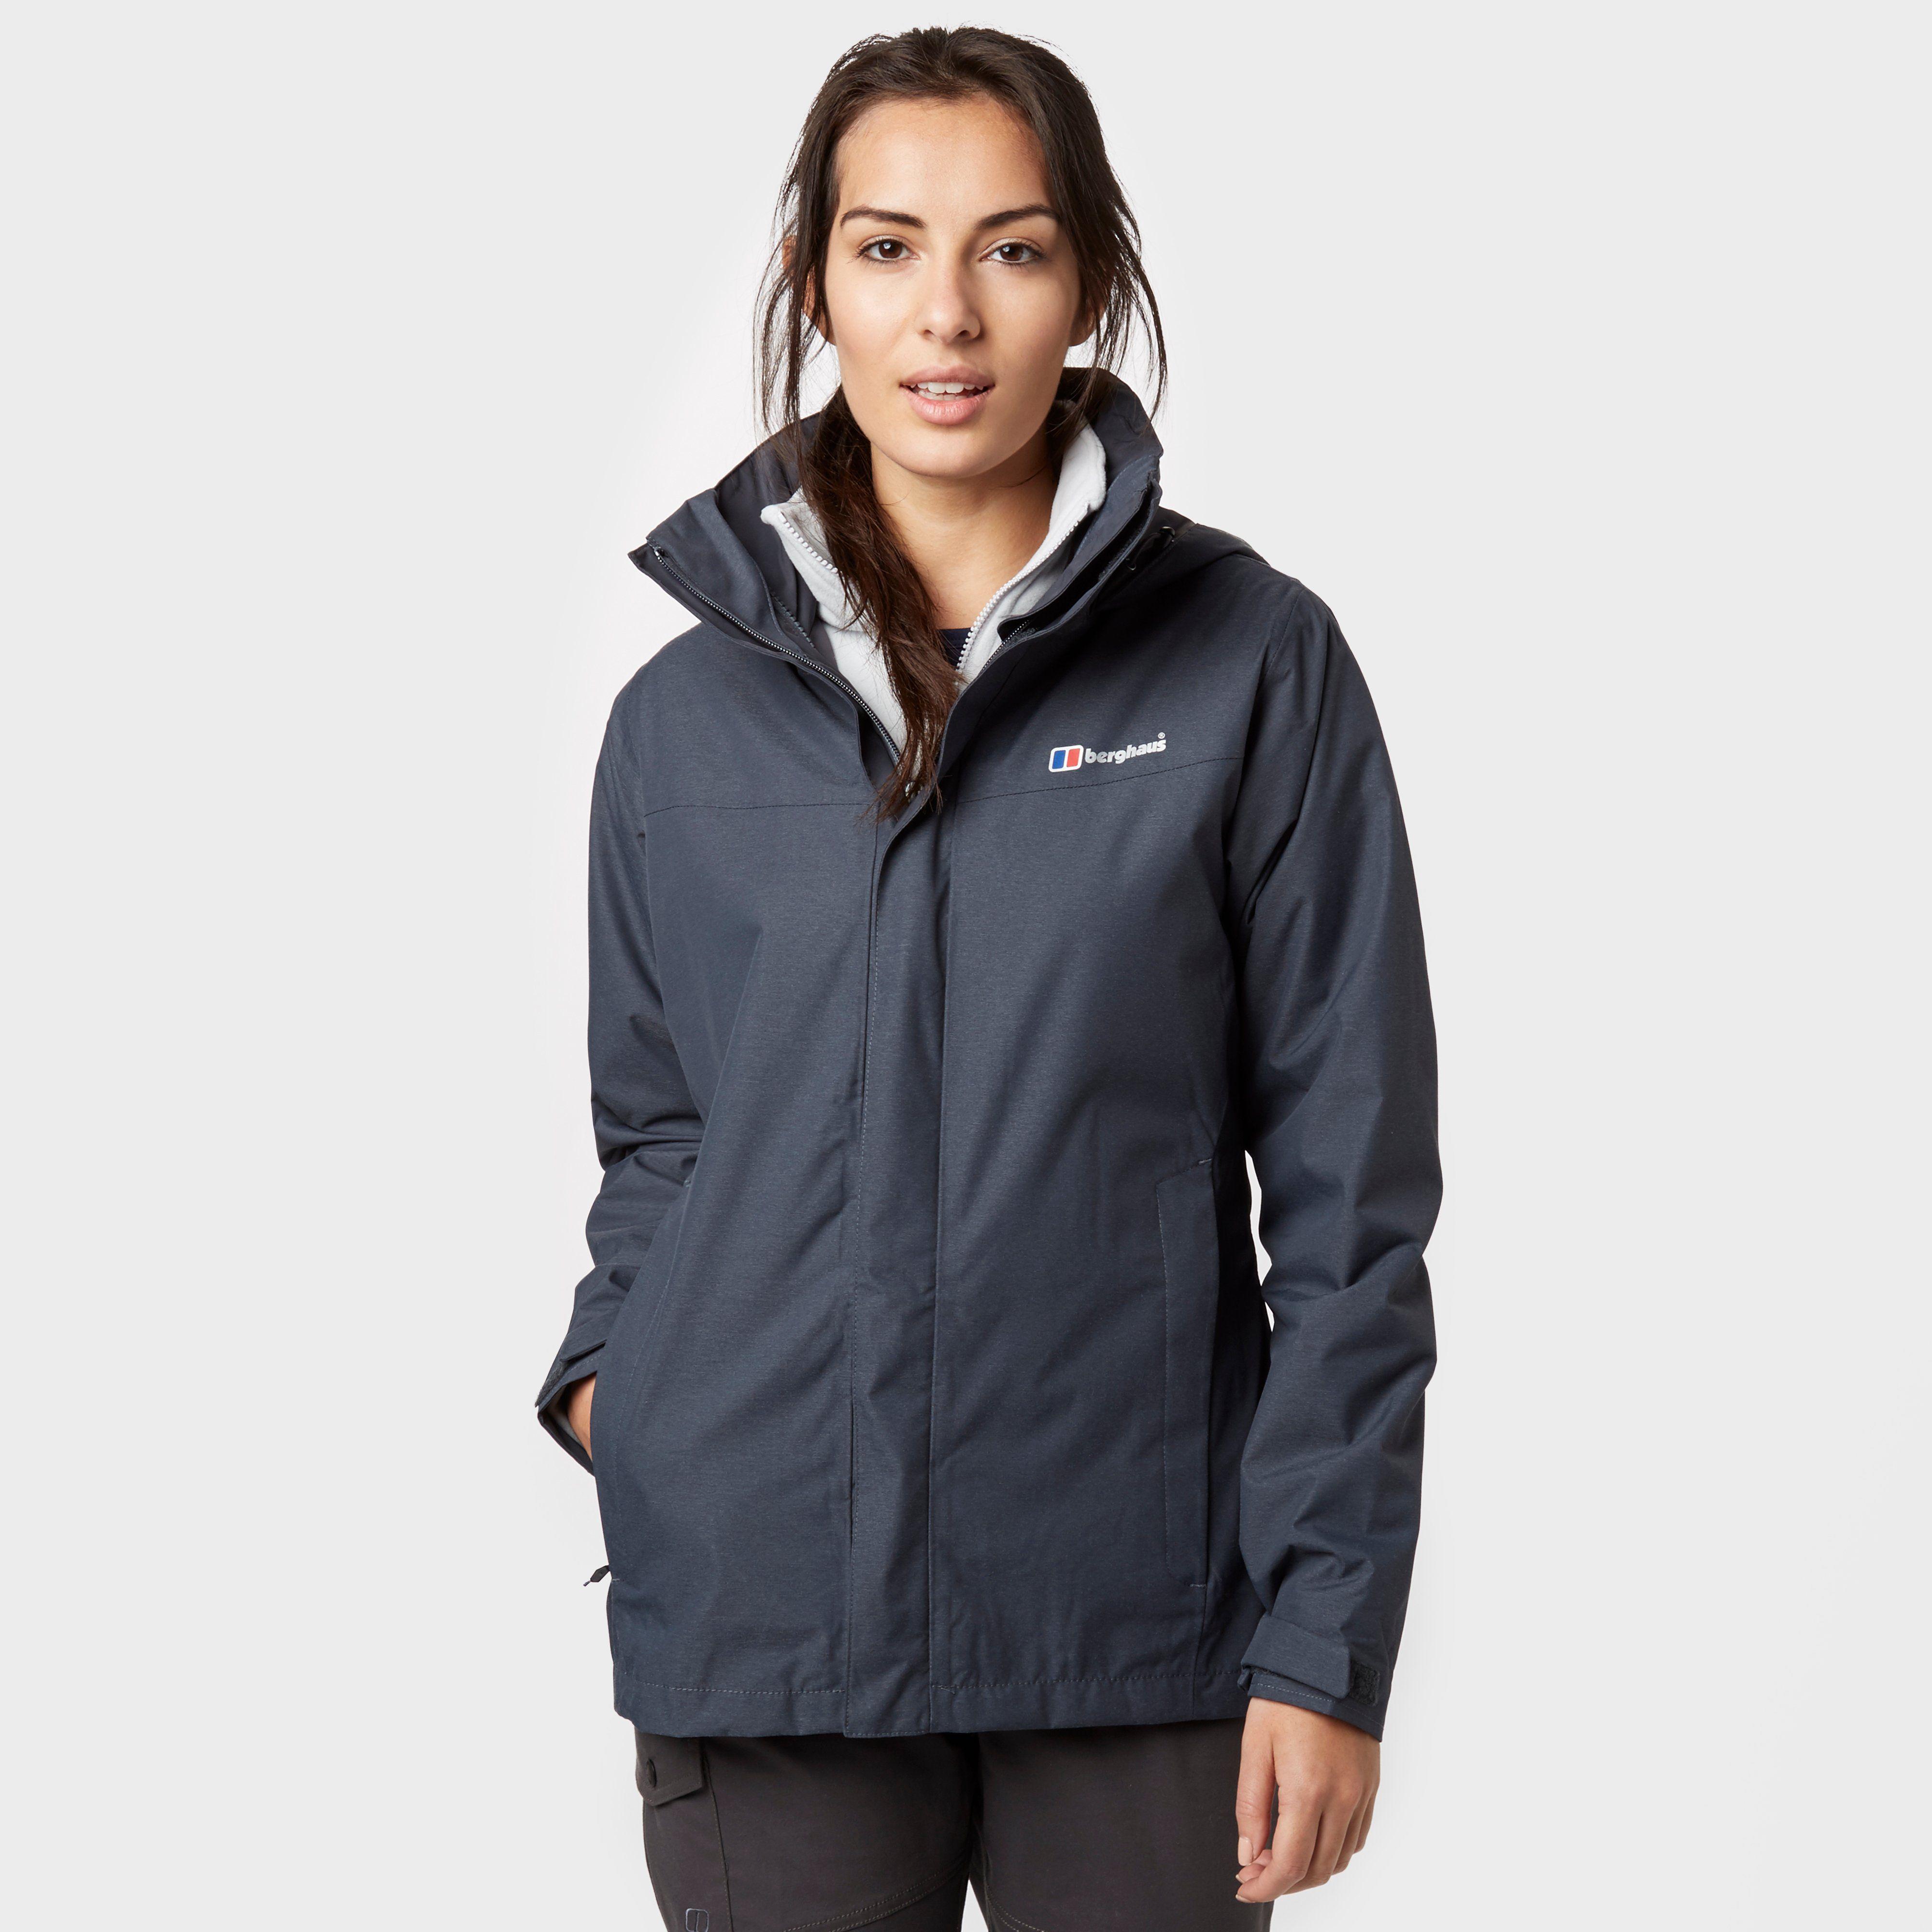 BERGHAUS Women's Howtown 3 in 1 Waterproof Jacket